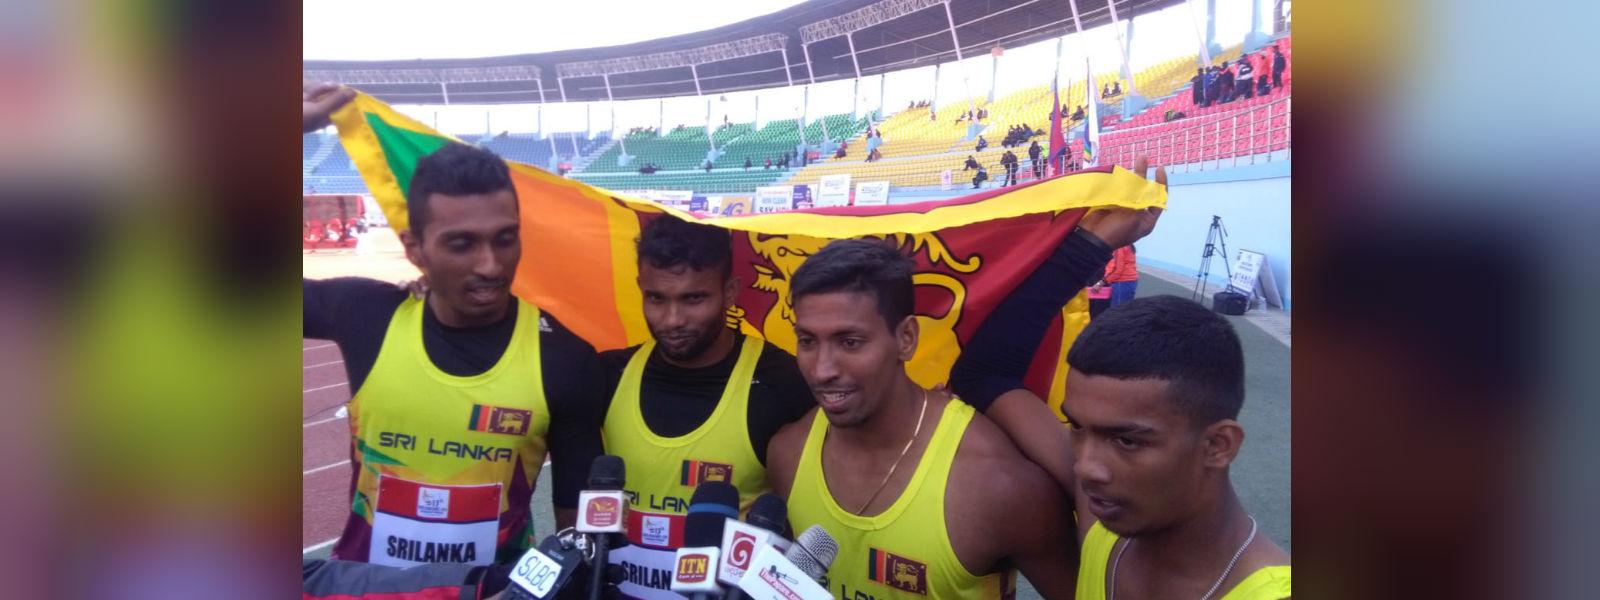 Sri Lankan sprinters set new relay SAG record